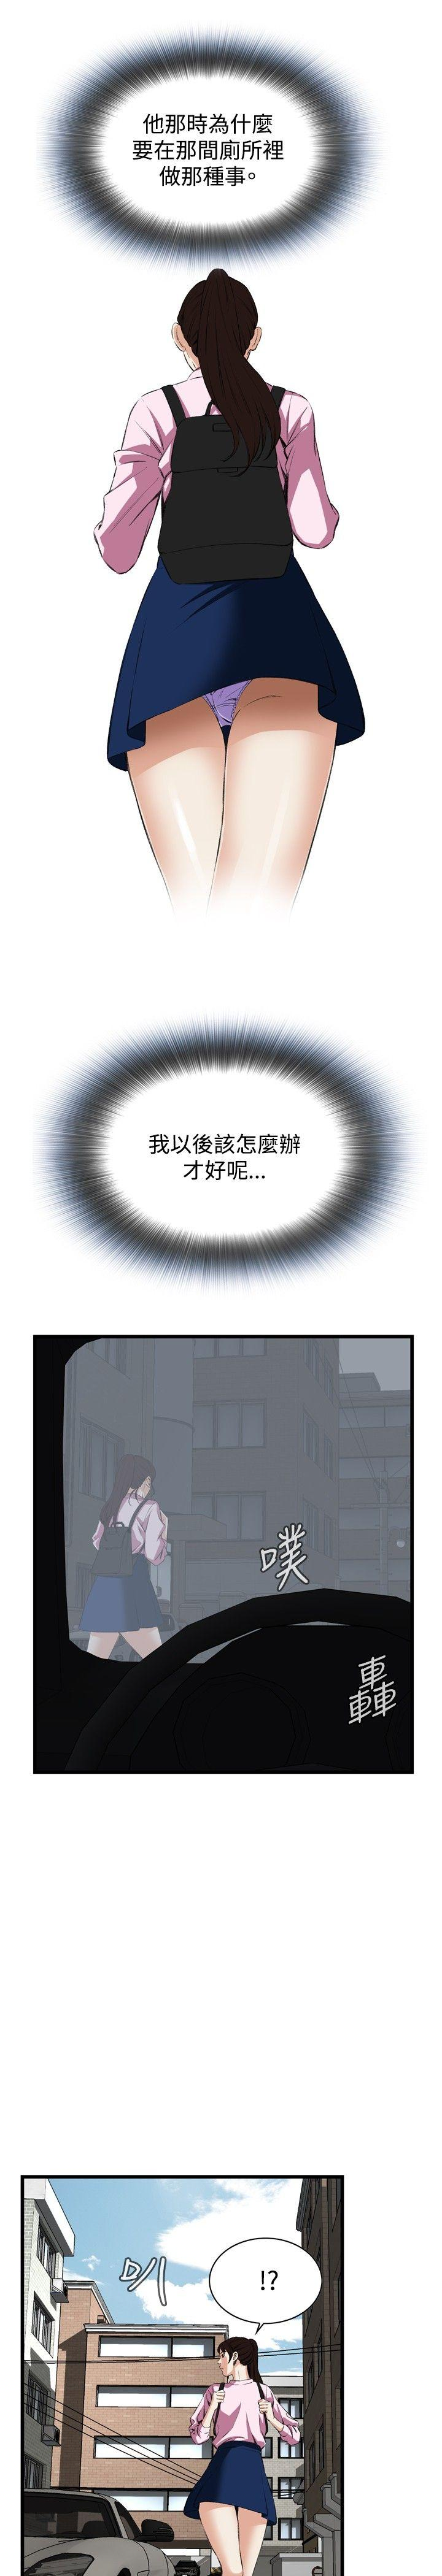 Take a Peek 偷窥 Ch.39~55 [Chinese]中文 507